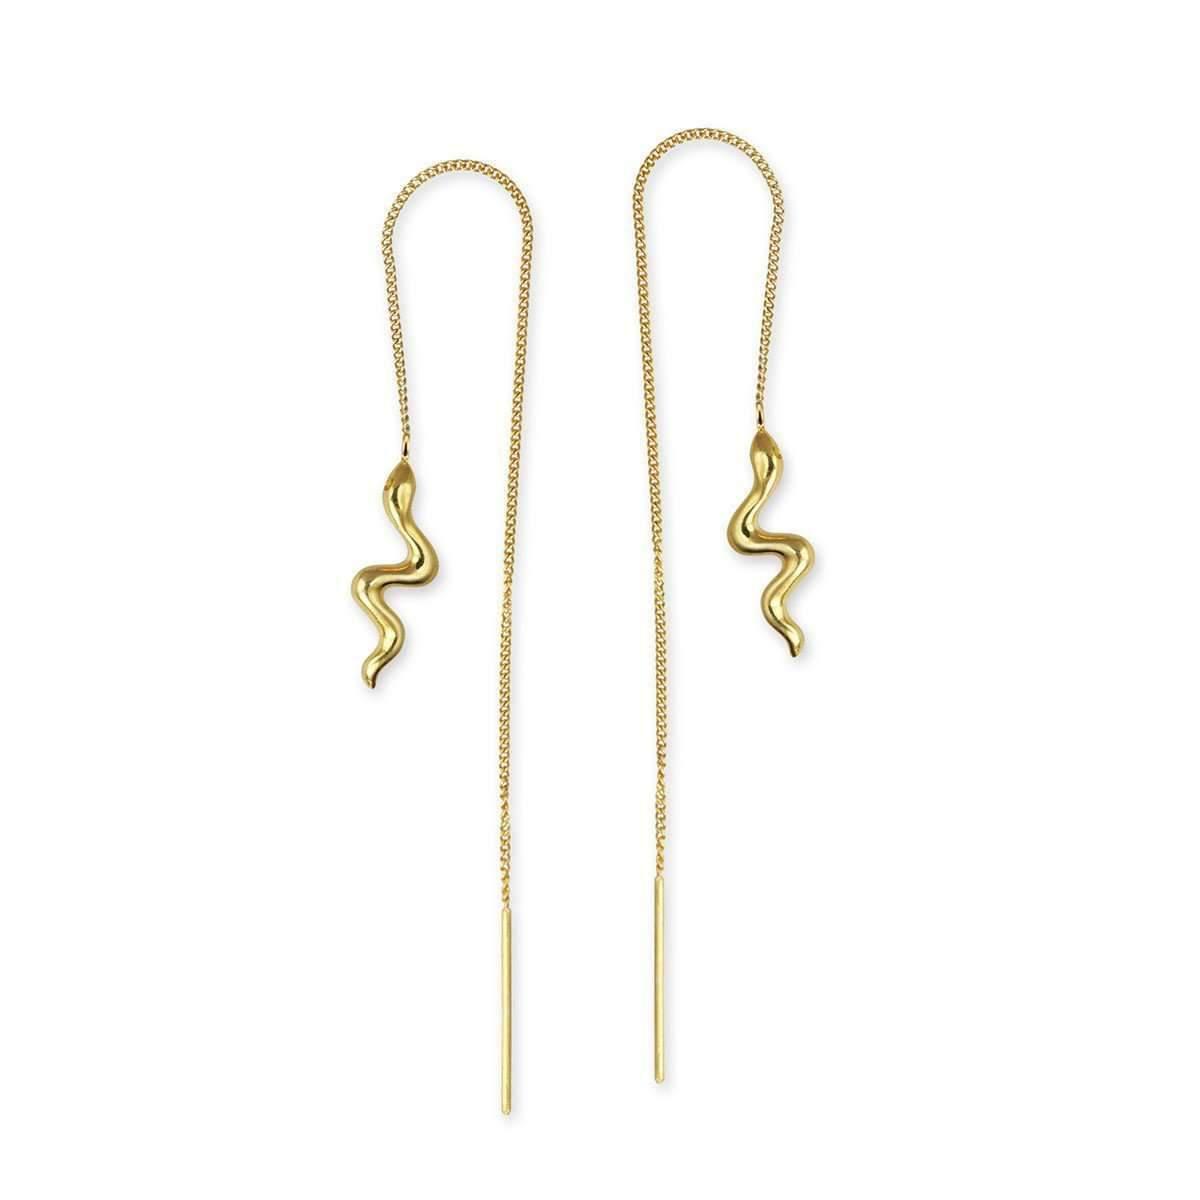 Jana Reinhardt Gold Plated Silver Snake Chain Earrings uJzIG6uh7